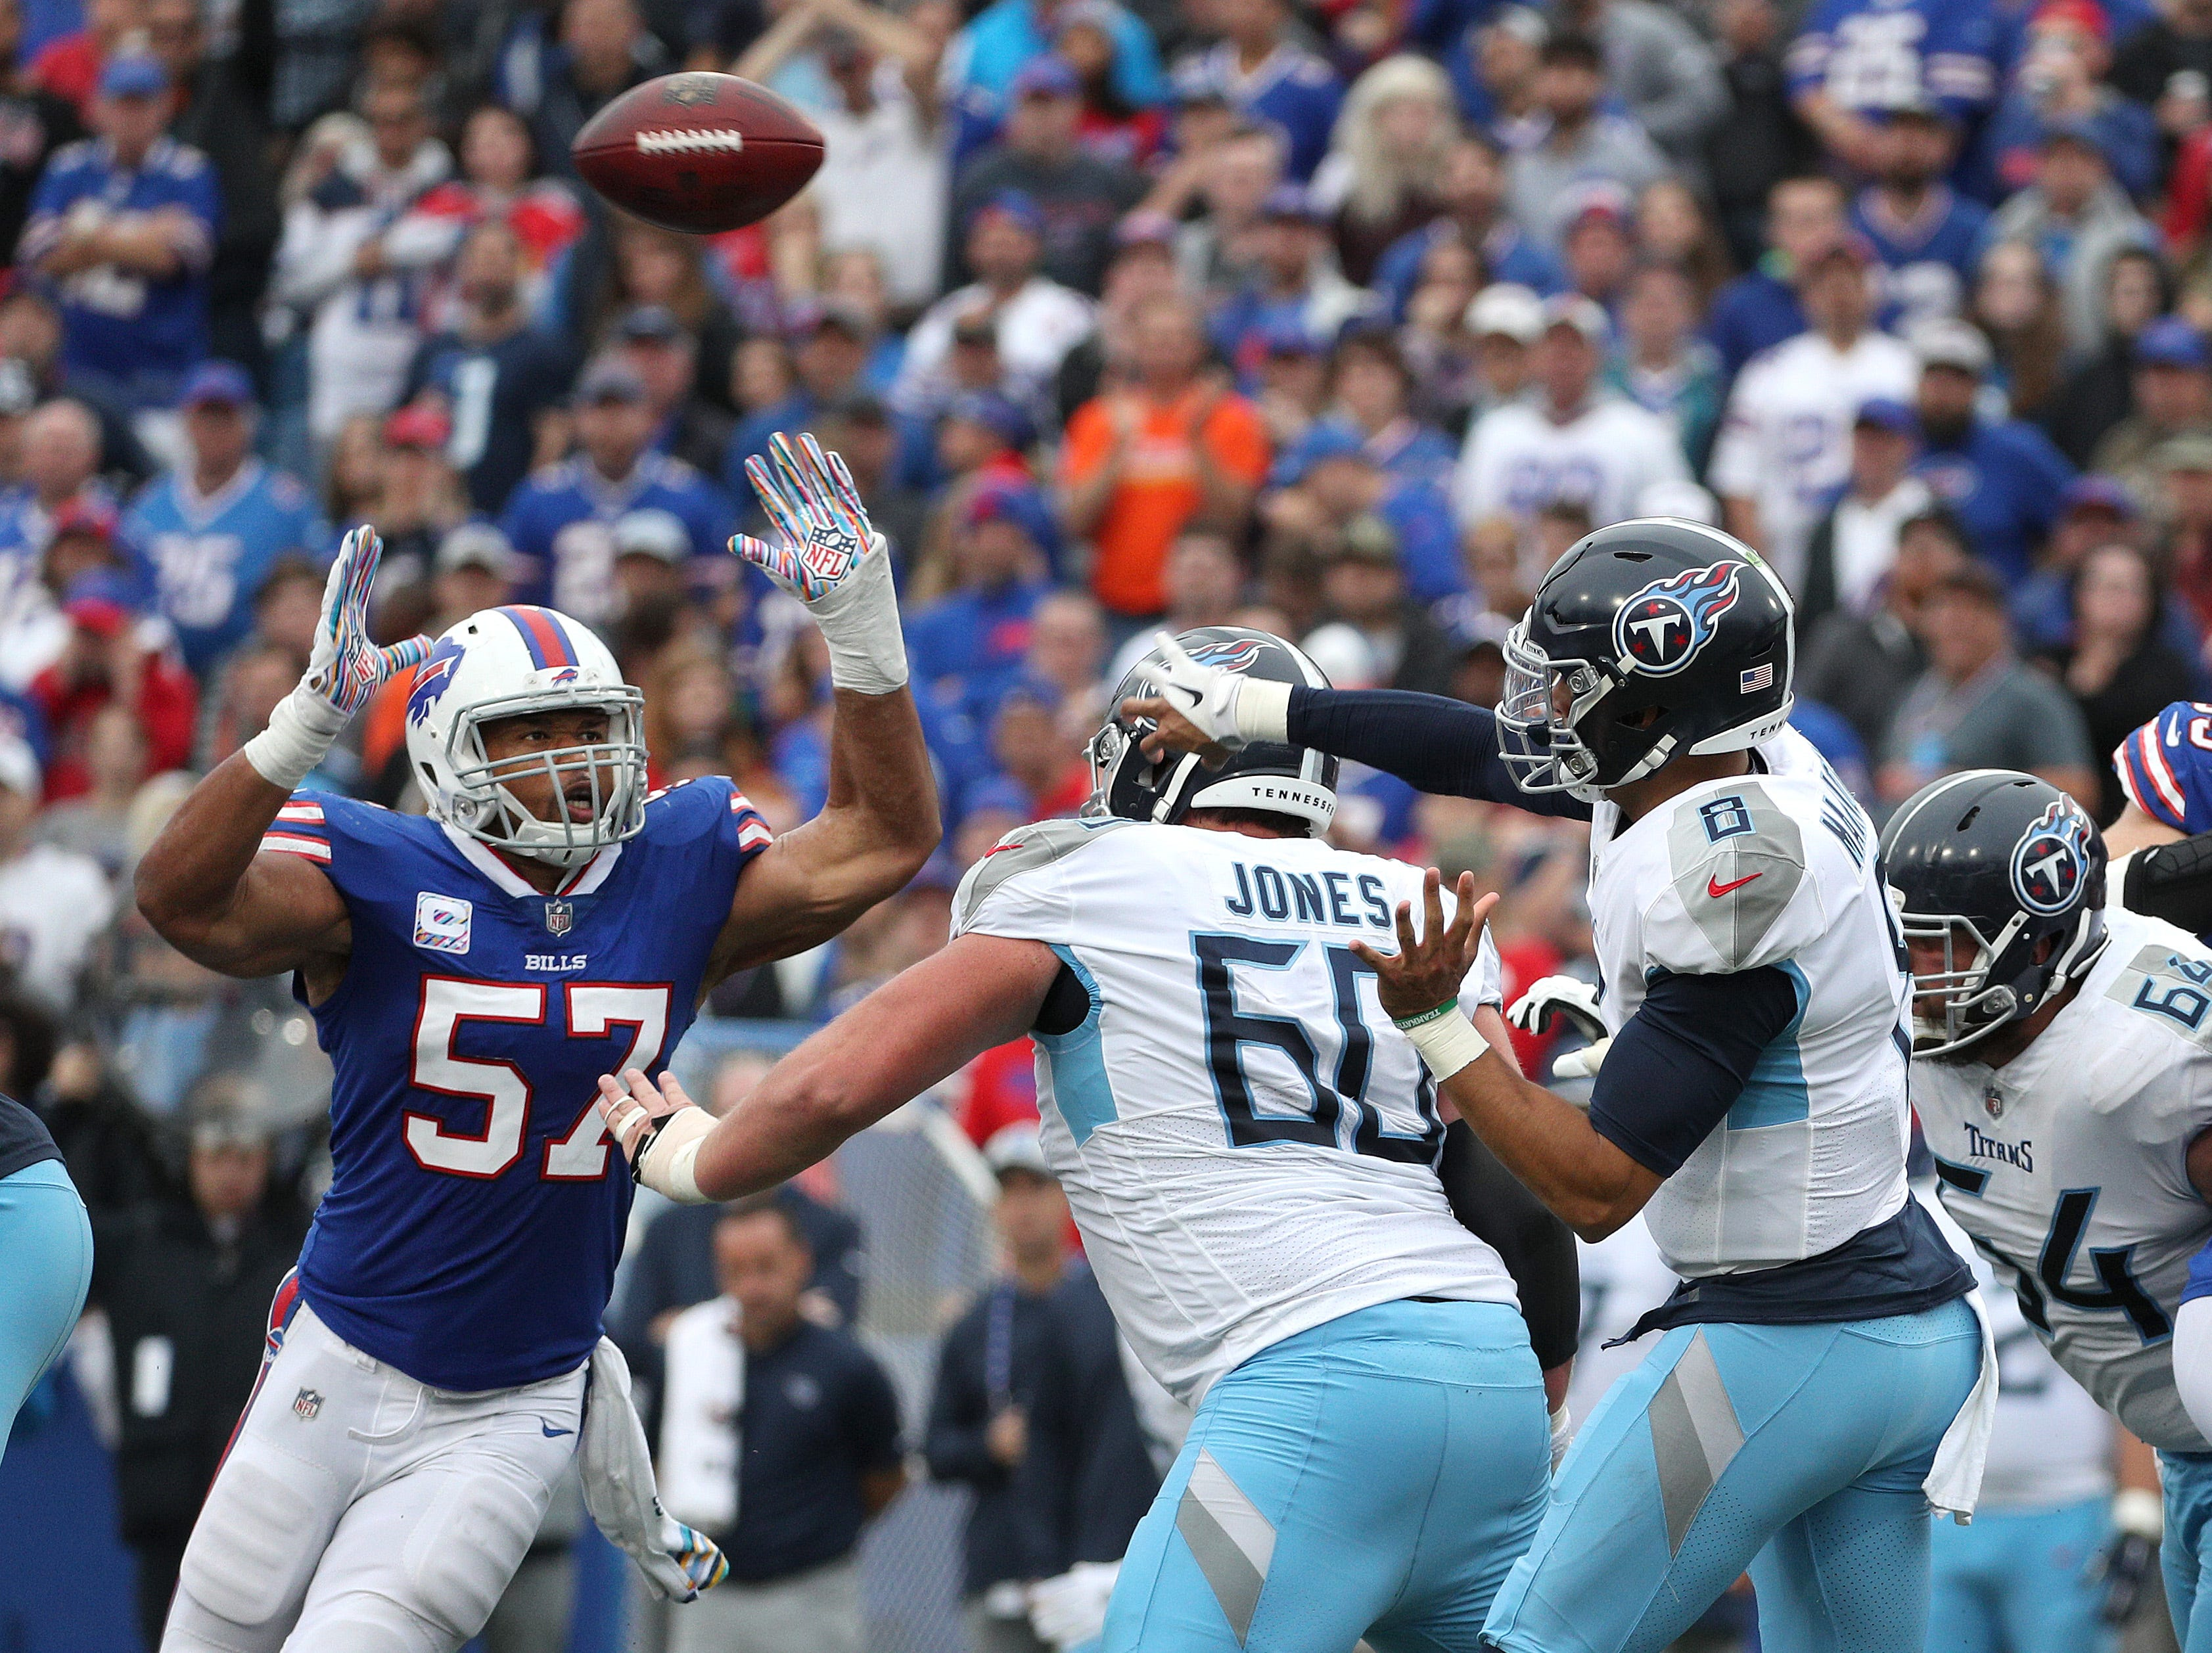 Bills linebacker Lorenzo Alexander pressures Titans quarterback Marcus Mariota.